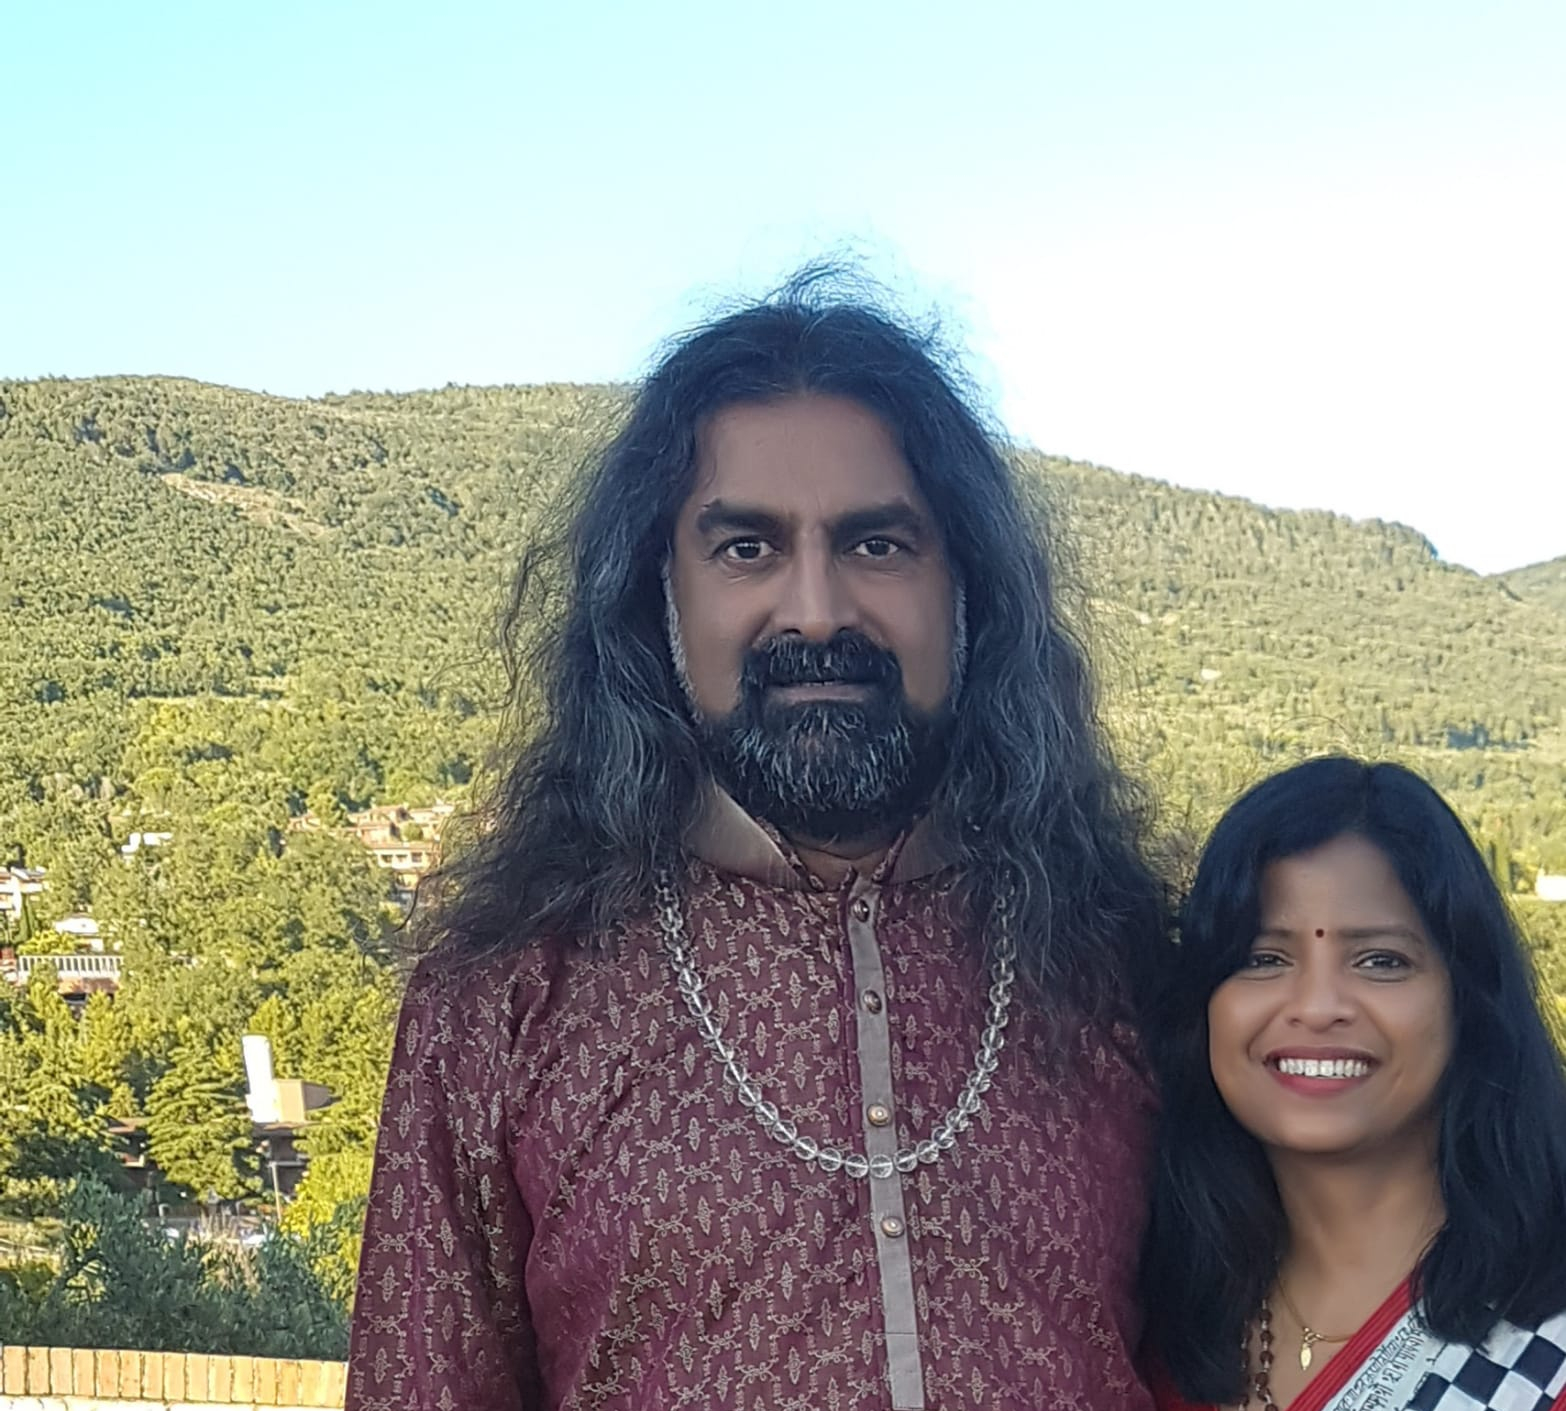 Mohanji, The Compassion Incarnate